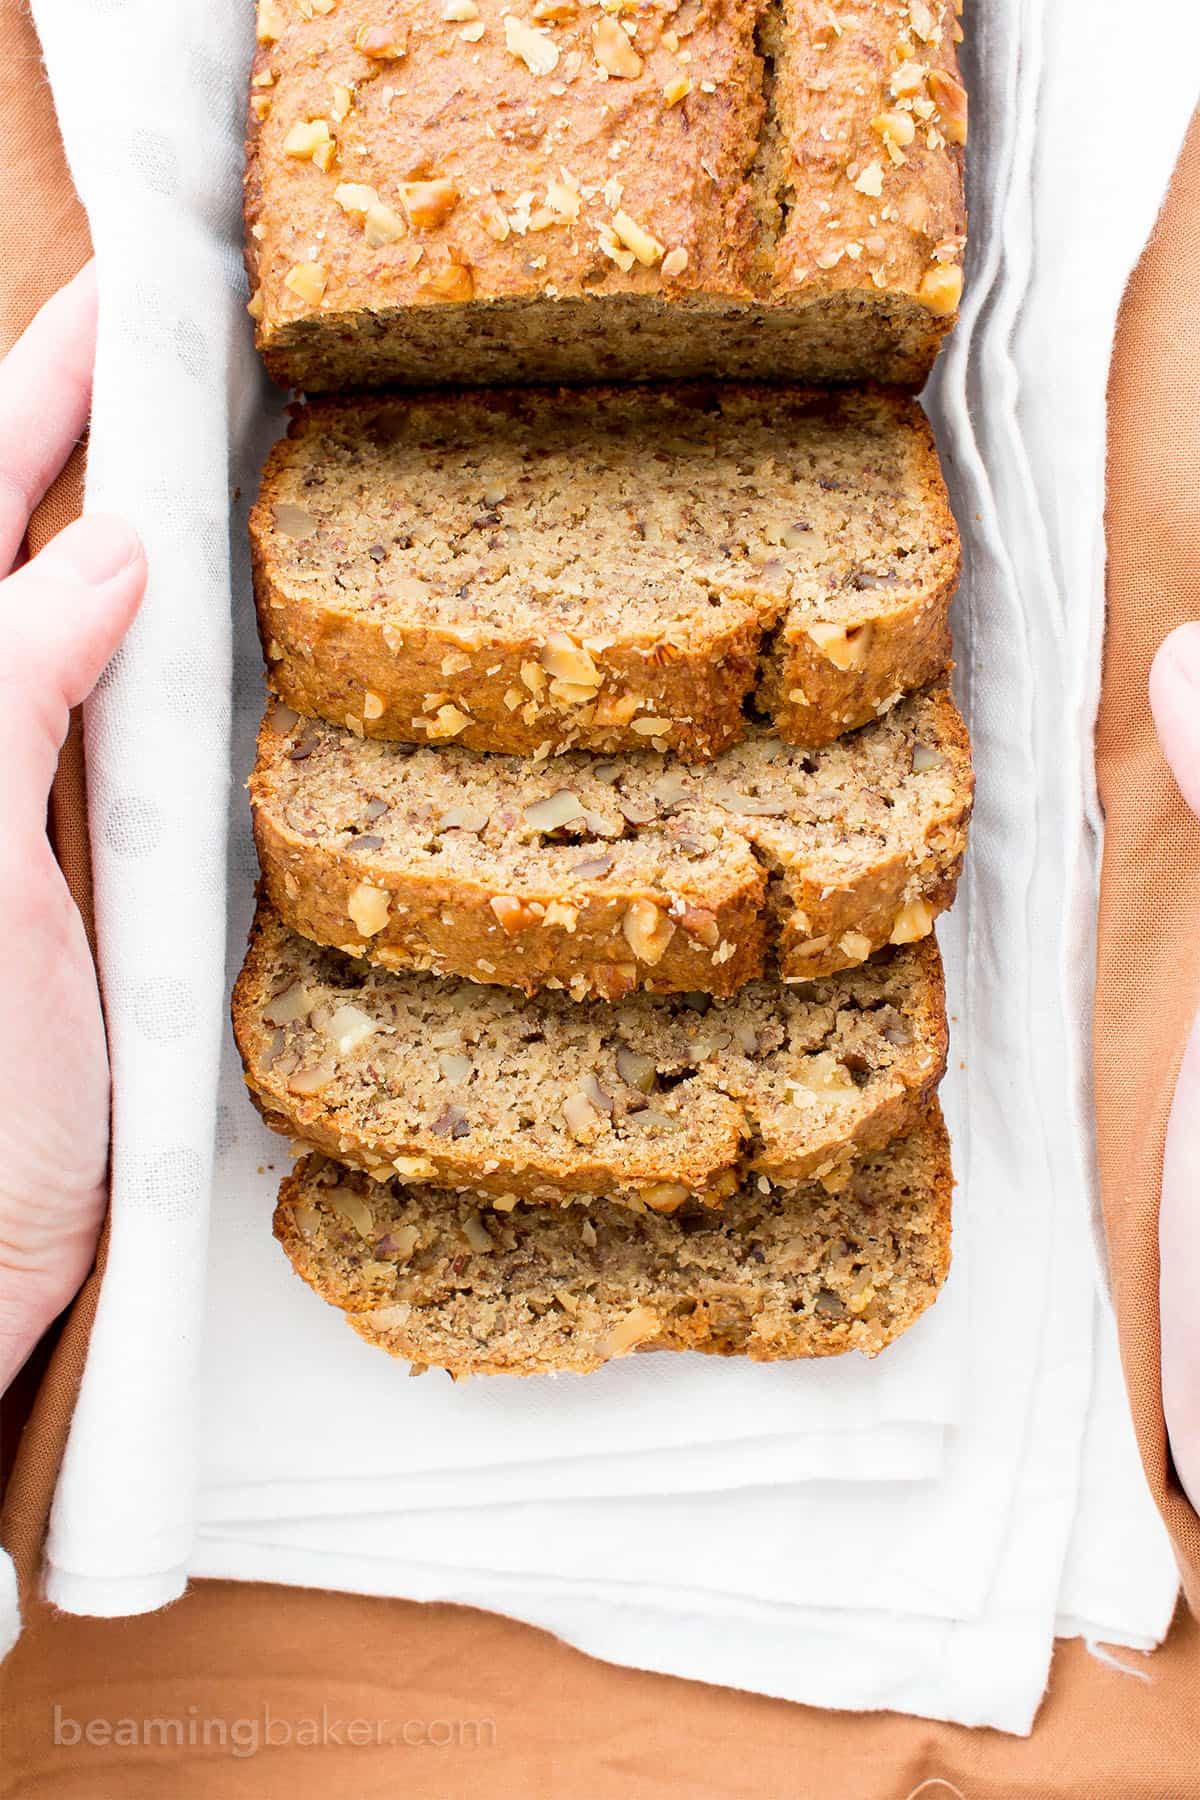 Gluten Free Banana Bread With Almond Flour  e Bowl Vegan Gluten Free Banana Nut Bread V GF Oat